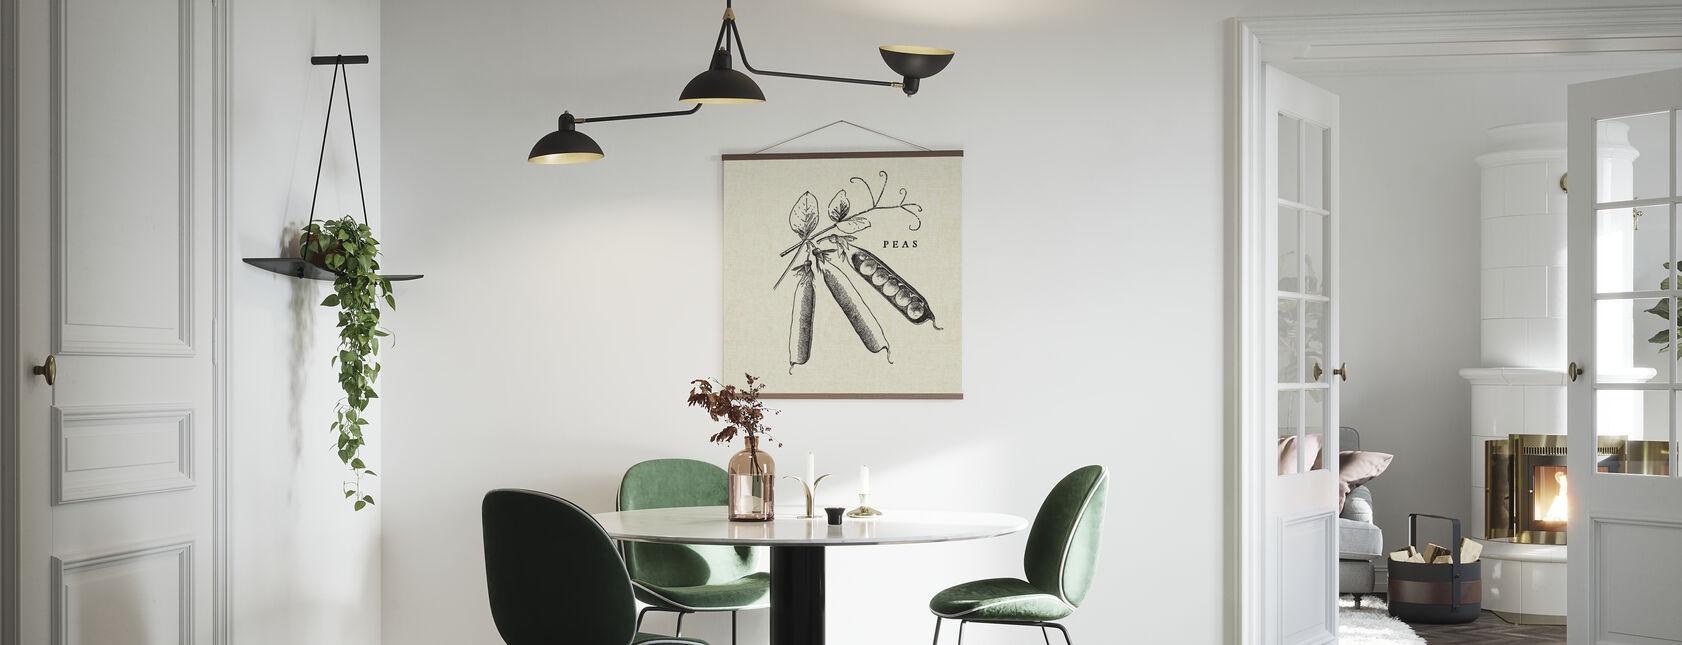 Keuken Illustratie - Erwten - Poster - Keuken